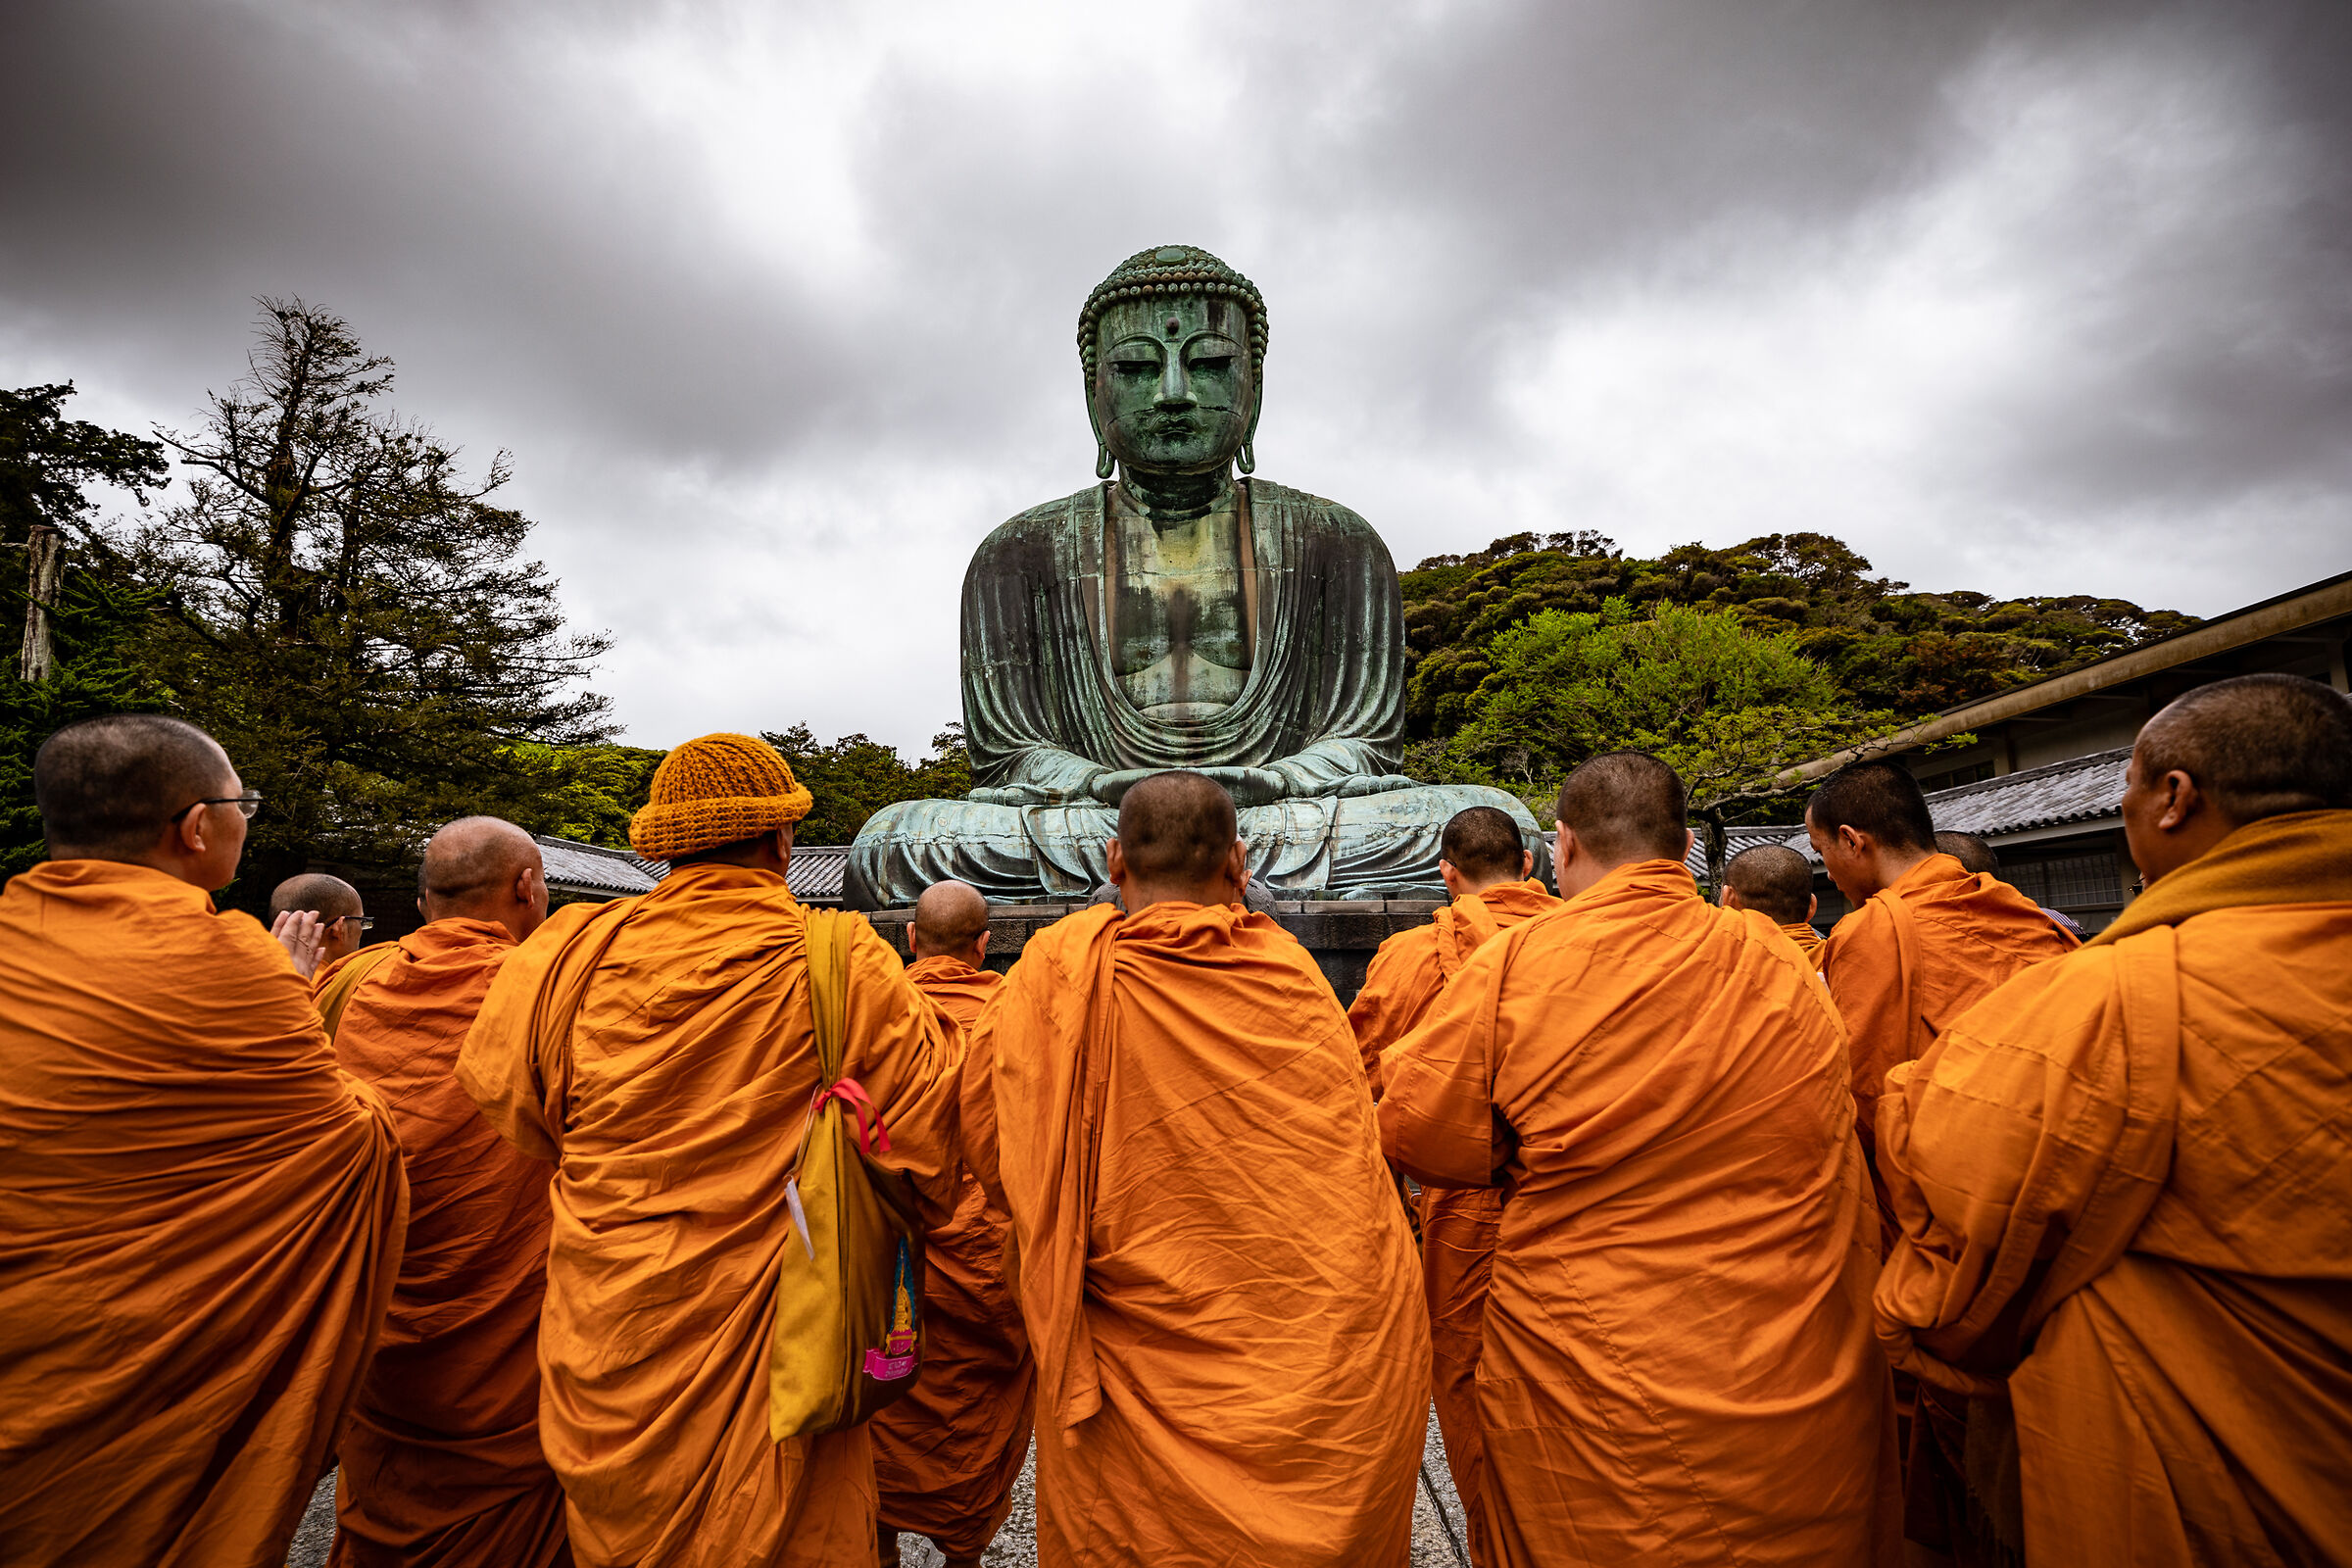 Great Buddha...